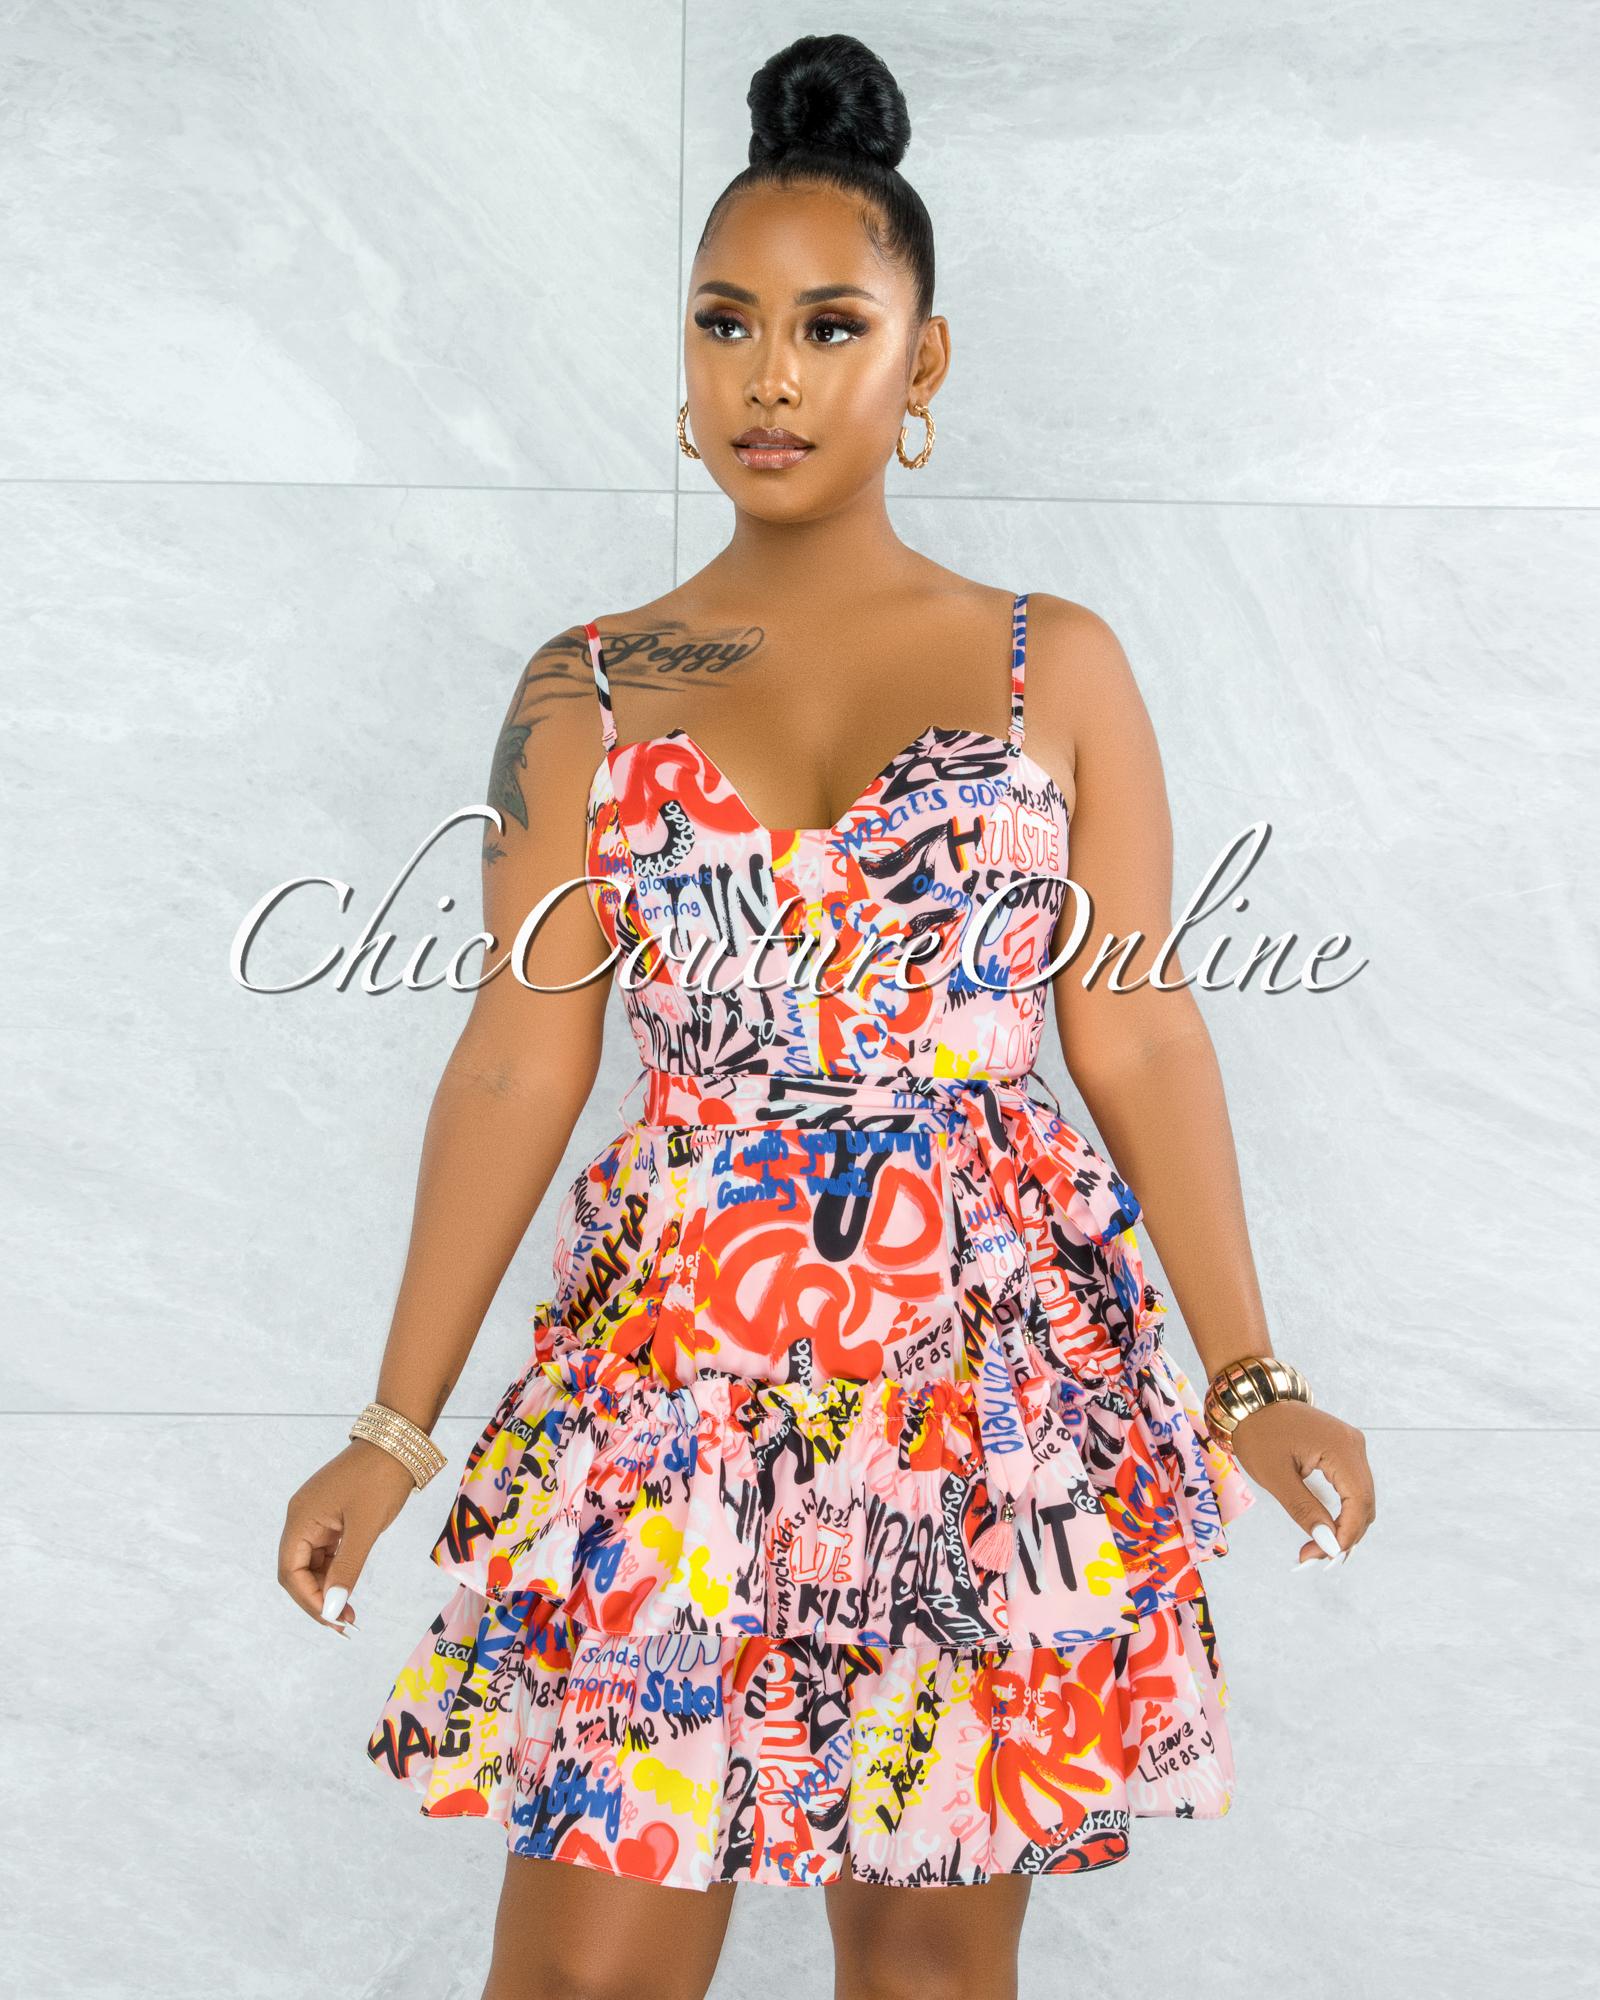 Ondrea Pink Graffiti Print Strappy Open Back Mini Dress